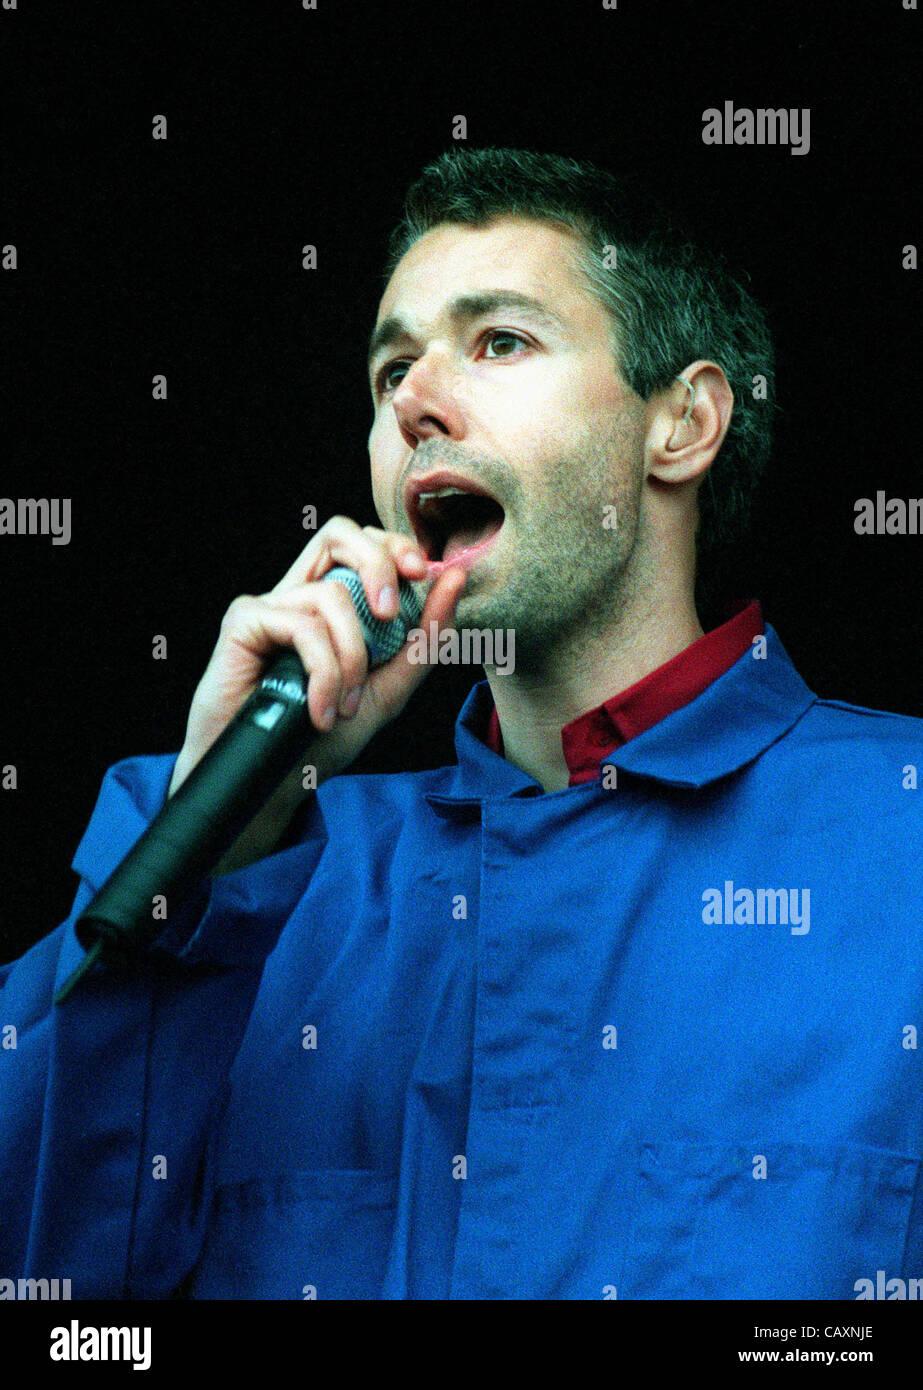 ADAM YAUCH ''MCA''.SINGER ''BEASTIE BOYS''.15/07/1998.N90F32C. - Stock Image